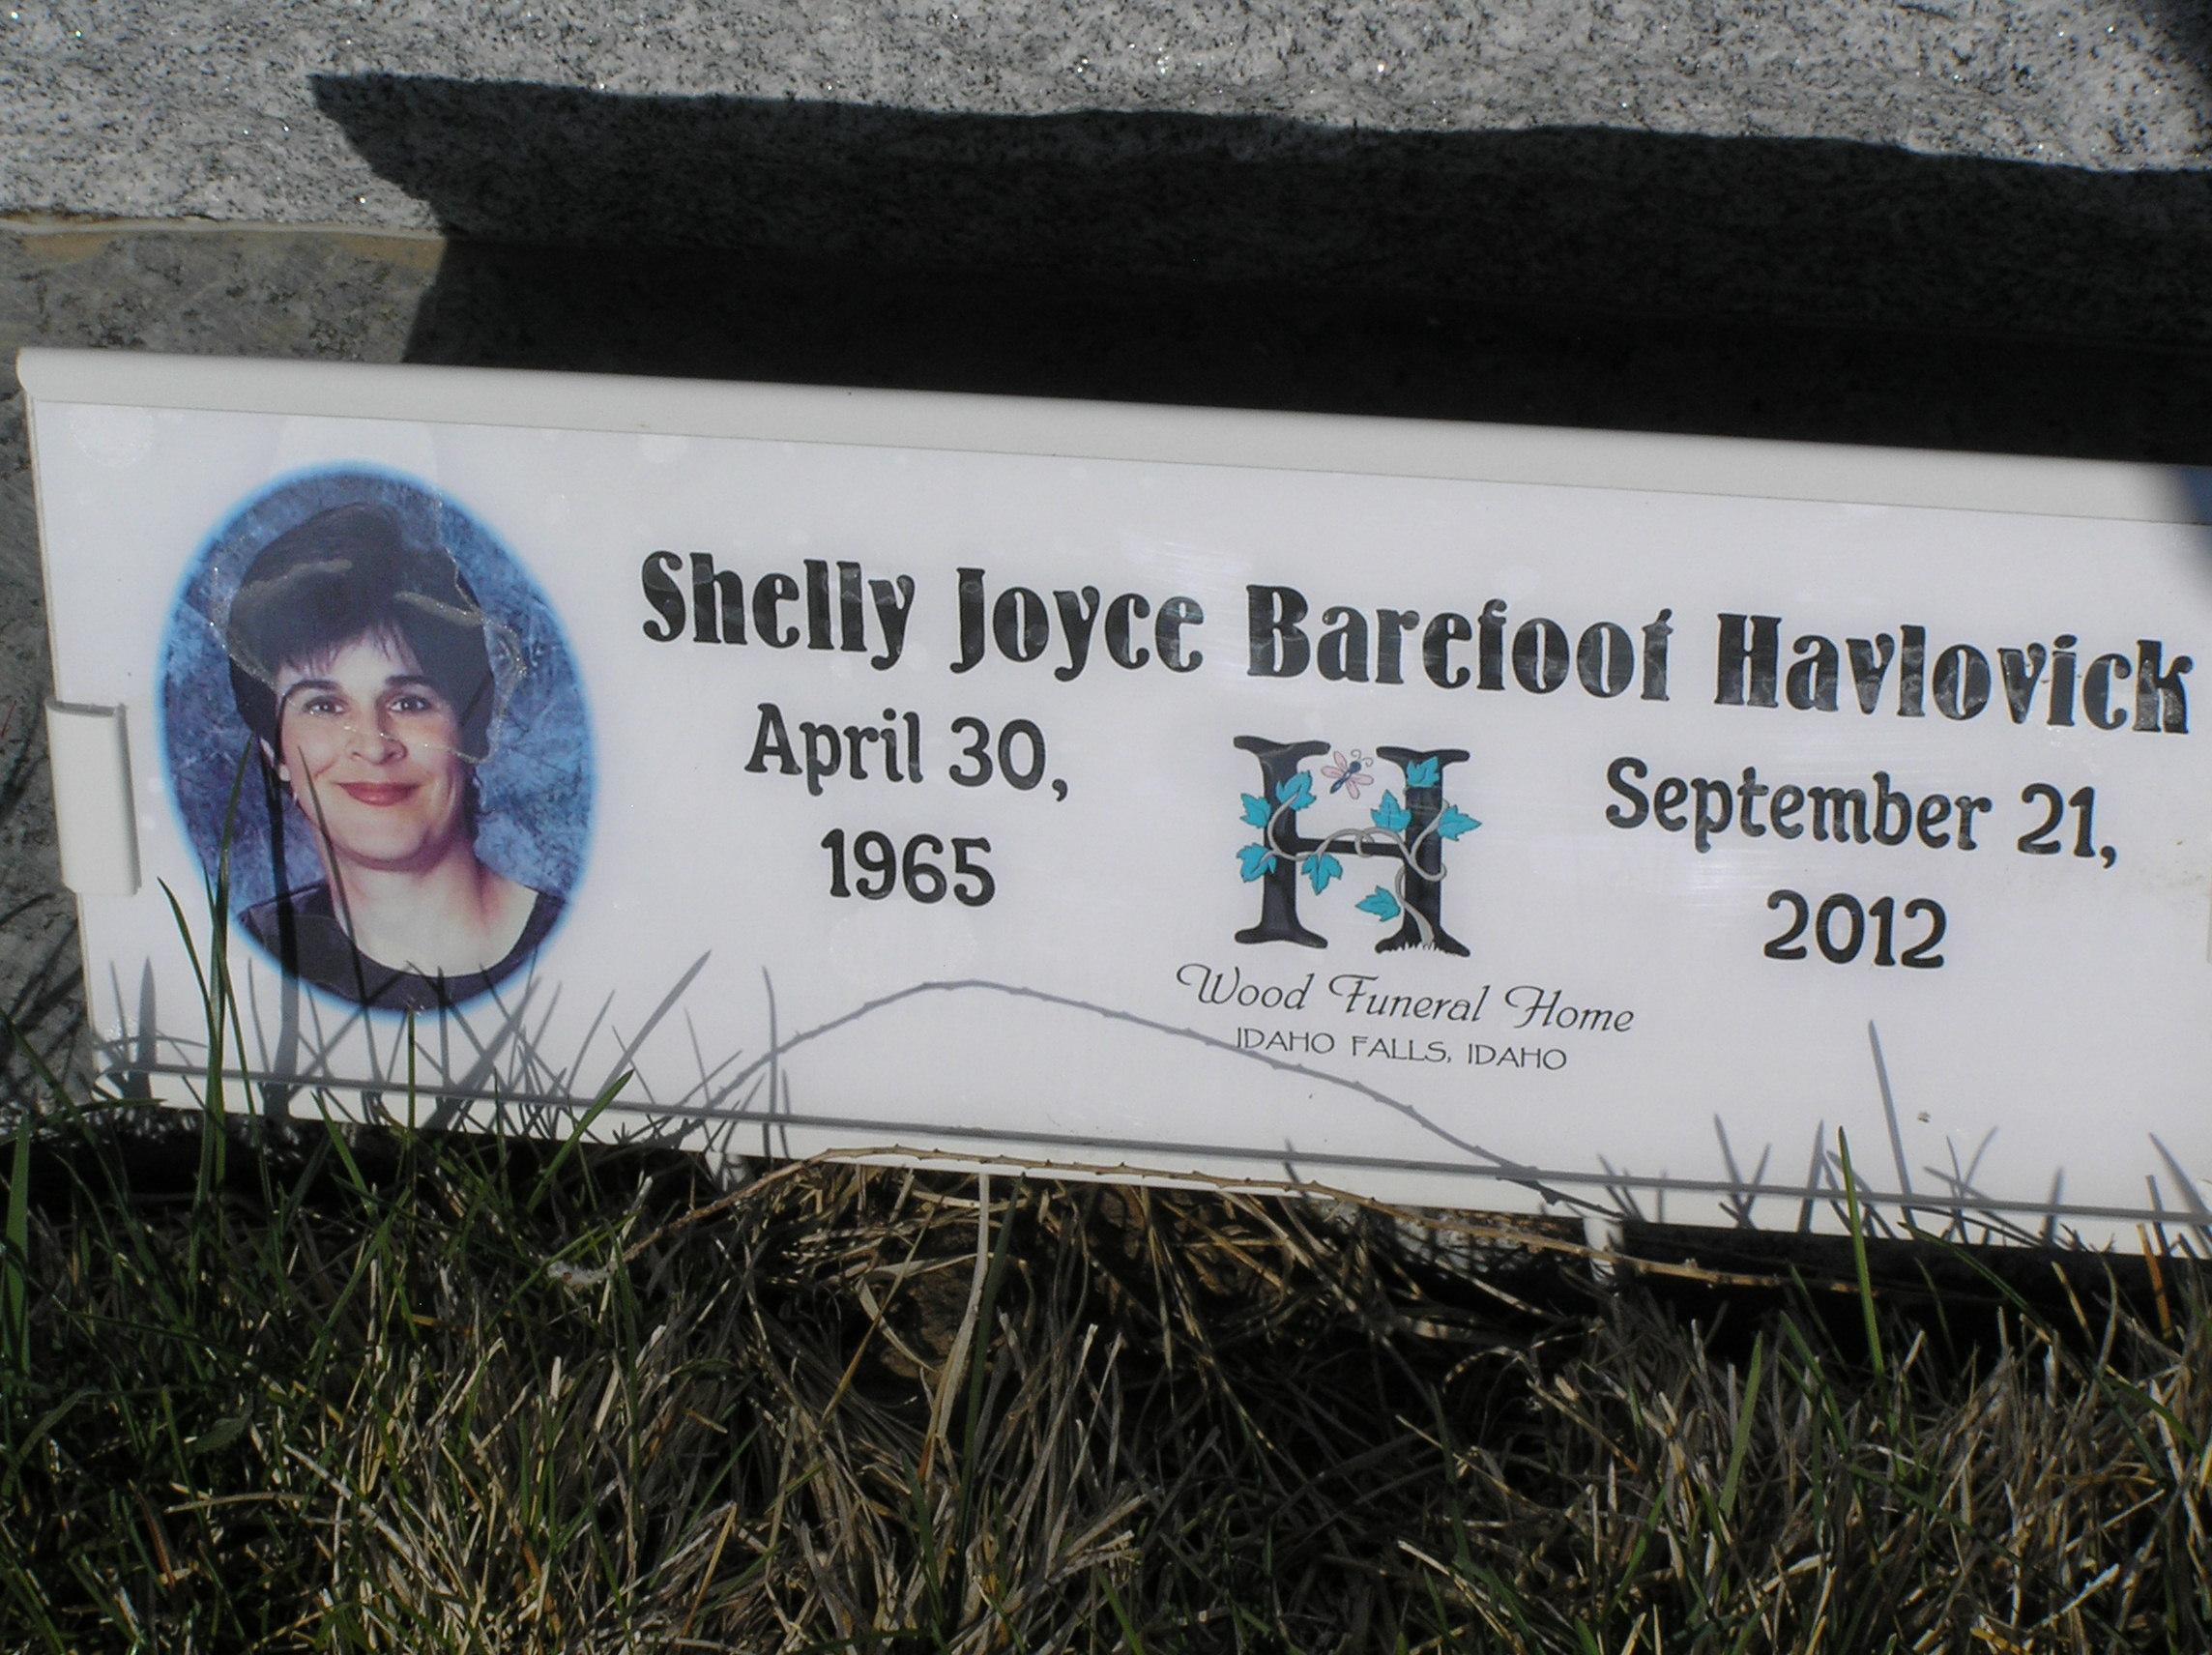 Shelly Joyce Barefoot Havlovick (1965-2012) - Find A Grave Memorial